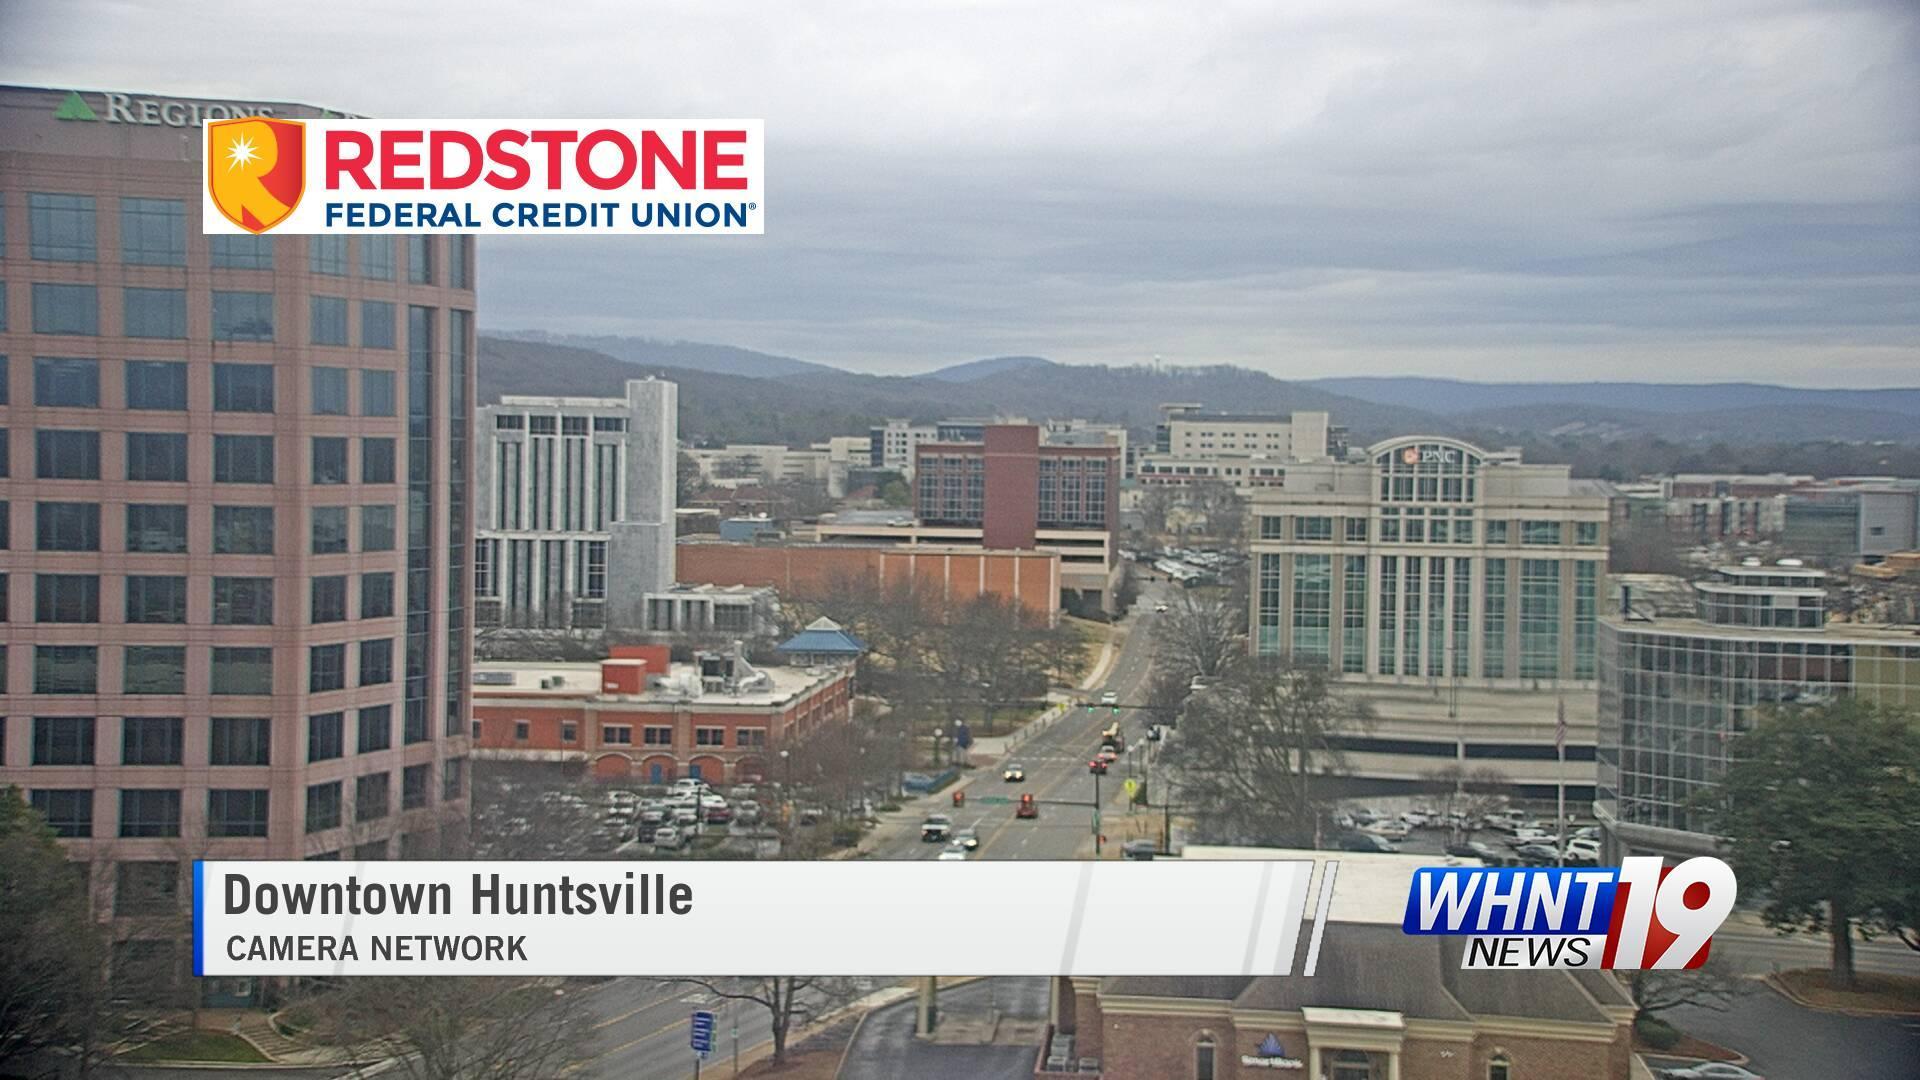 Webcam Huntsville: Jack's Camera Network